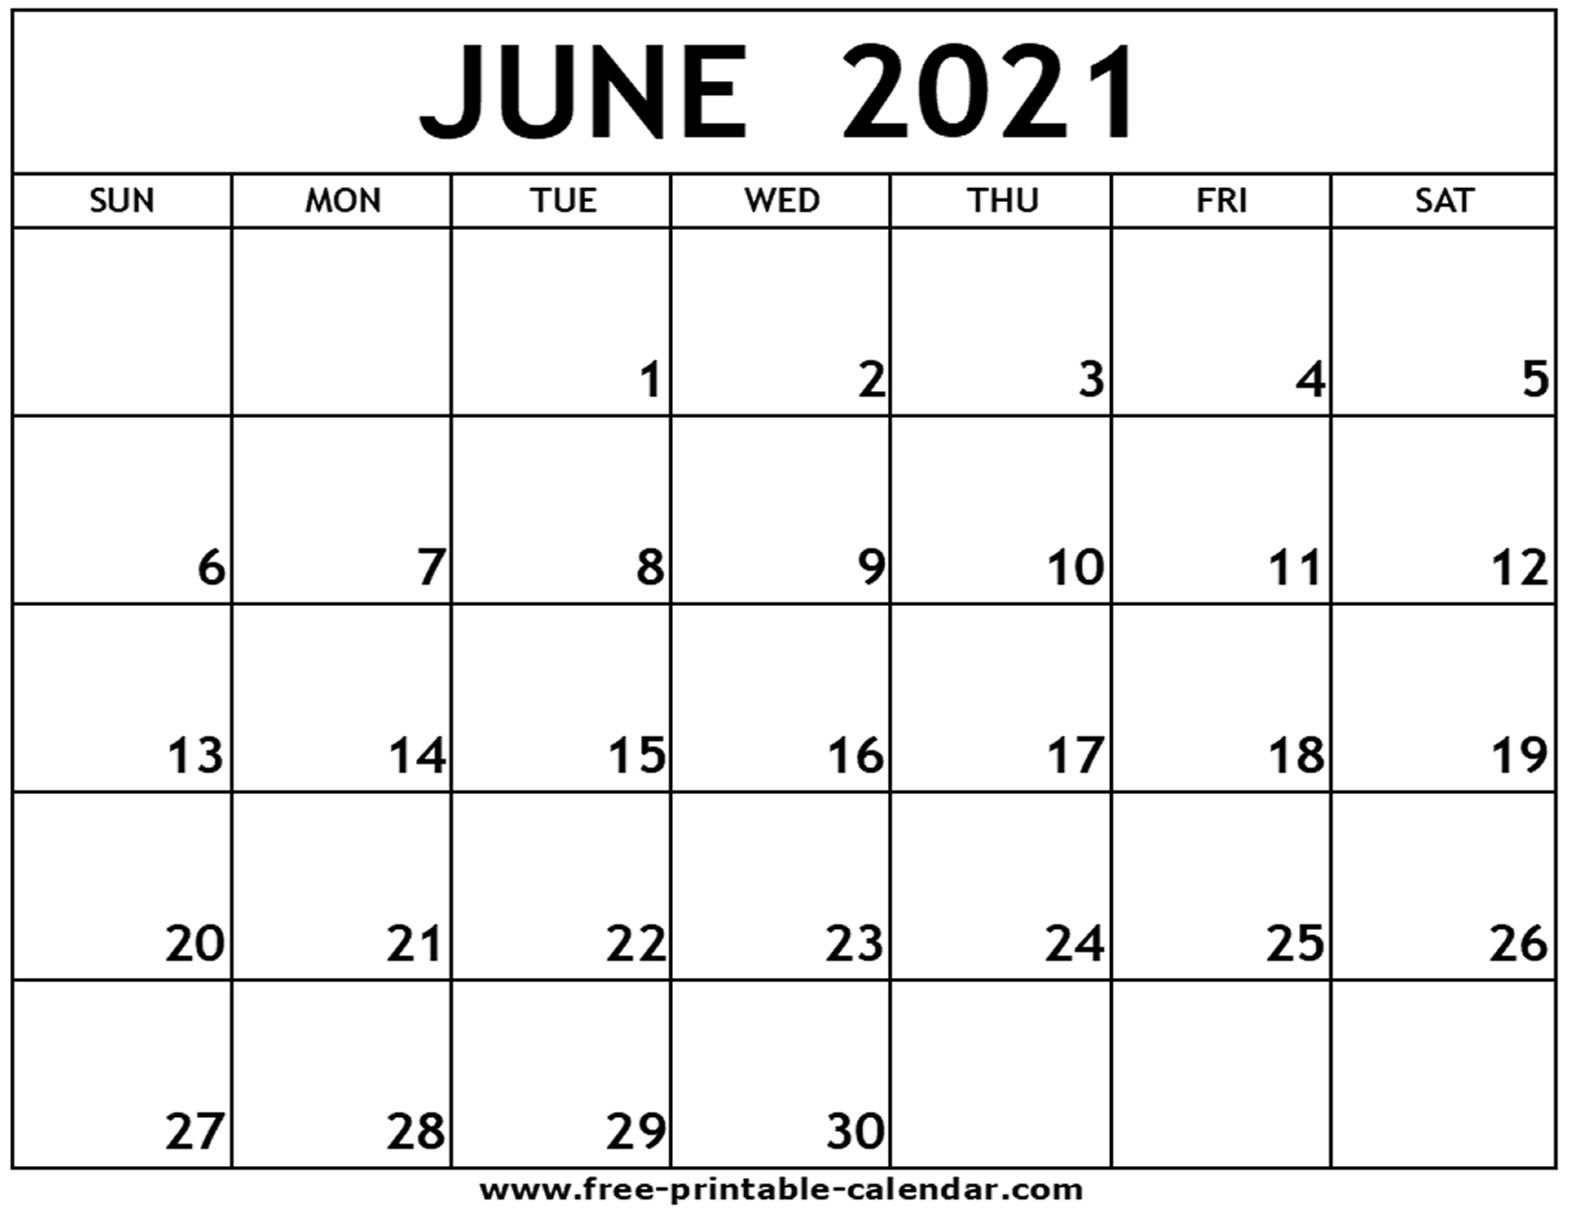 Universal Free Calendars 2021 Printable That You Can Edit | Get Your Calendar Printable June 2021 Calendar Kuda